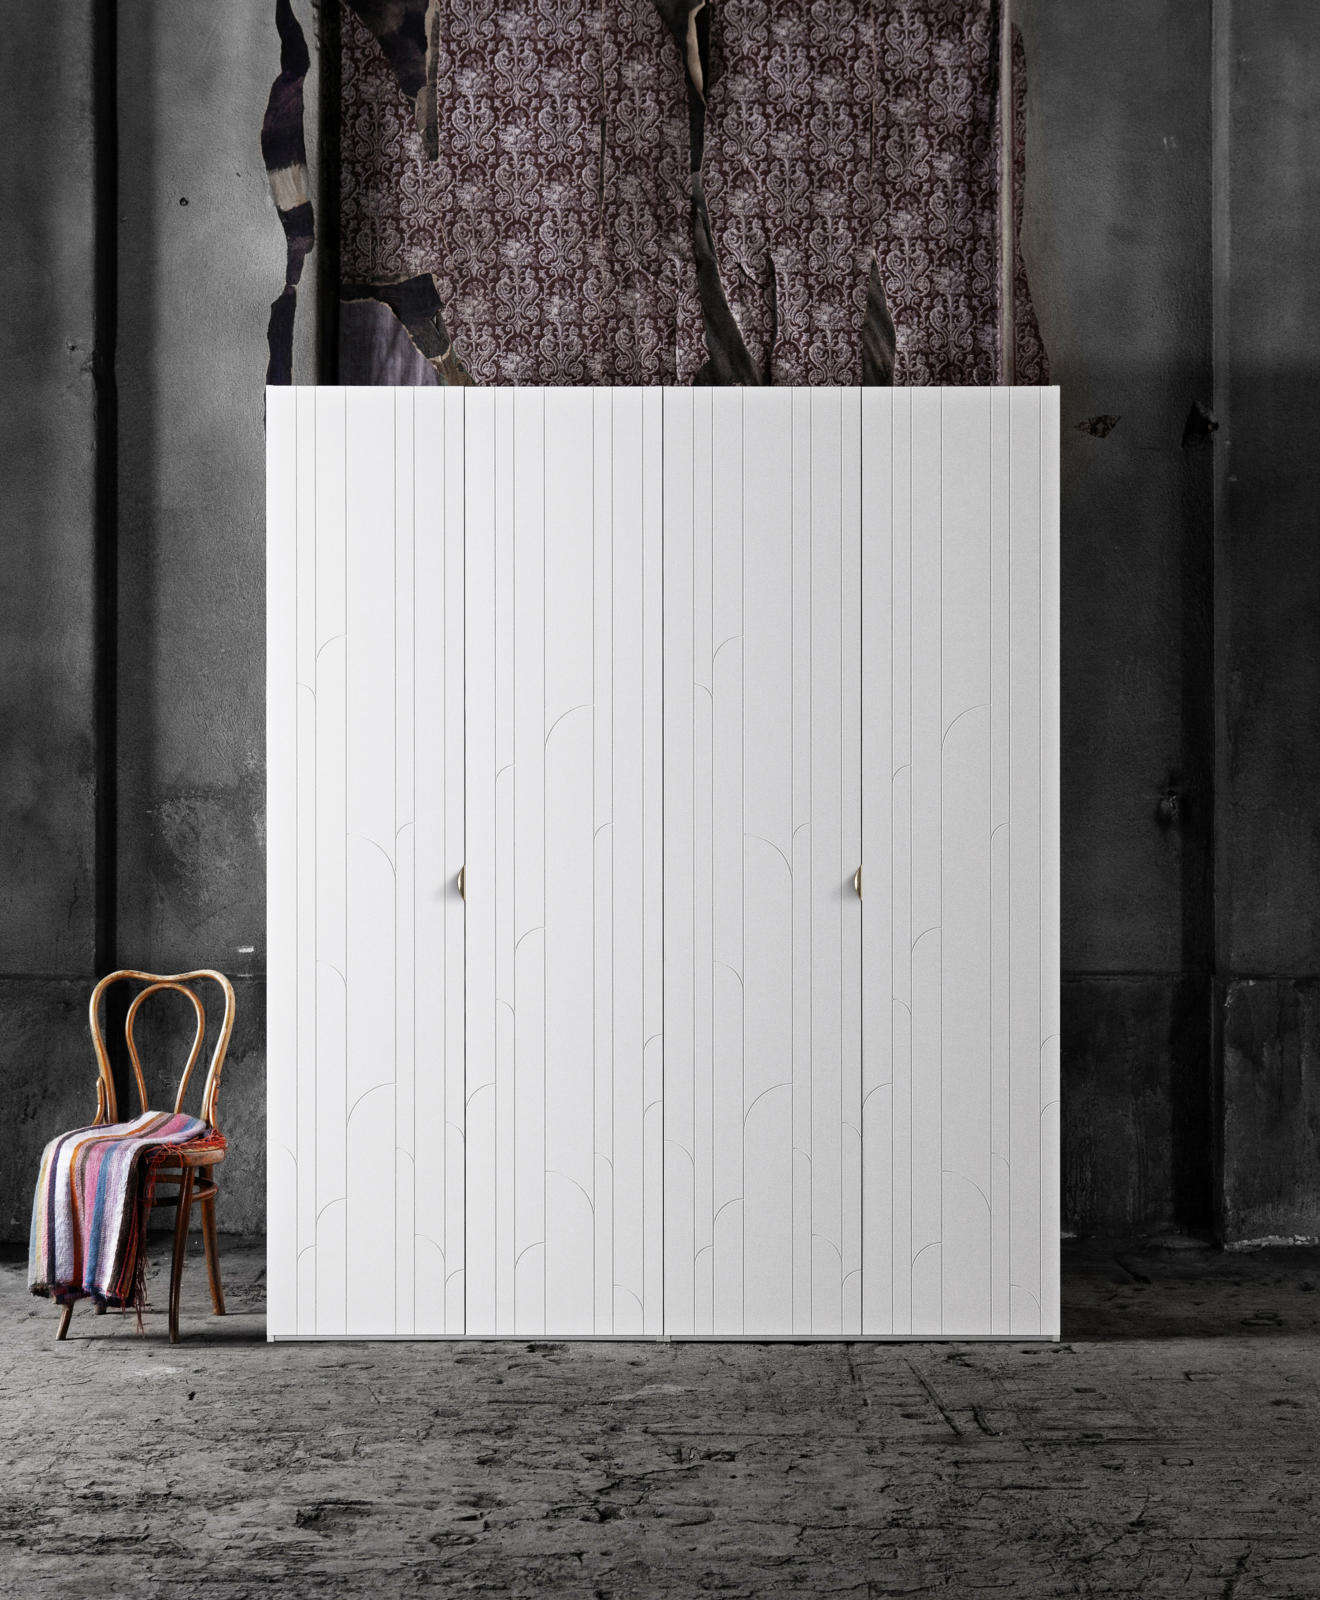 10 Favorite Ikea Pax Wardrobe Hacks from Designers